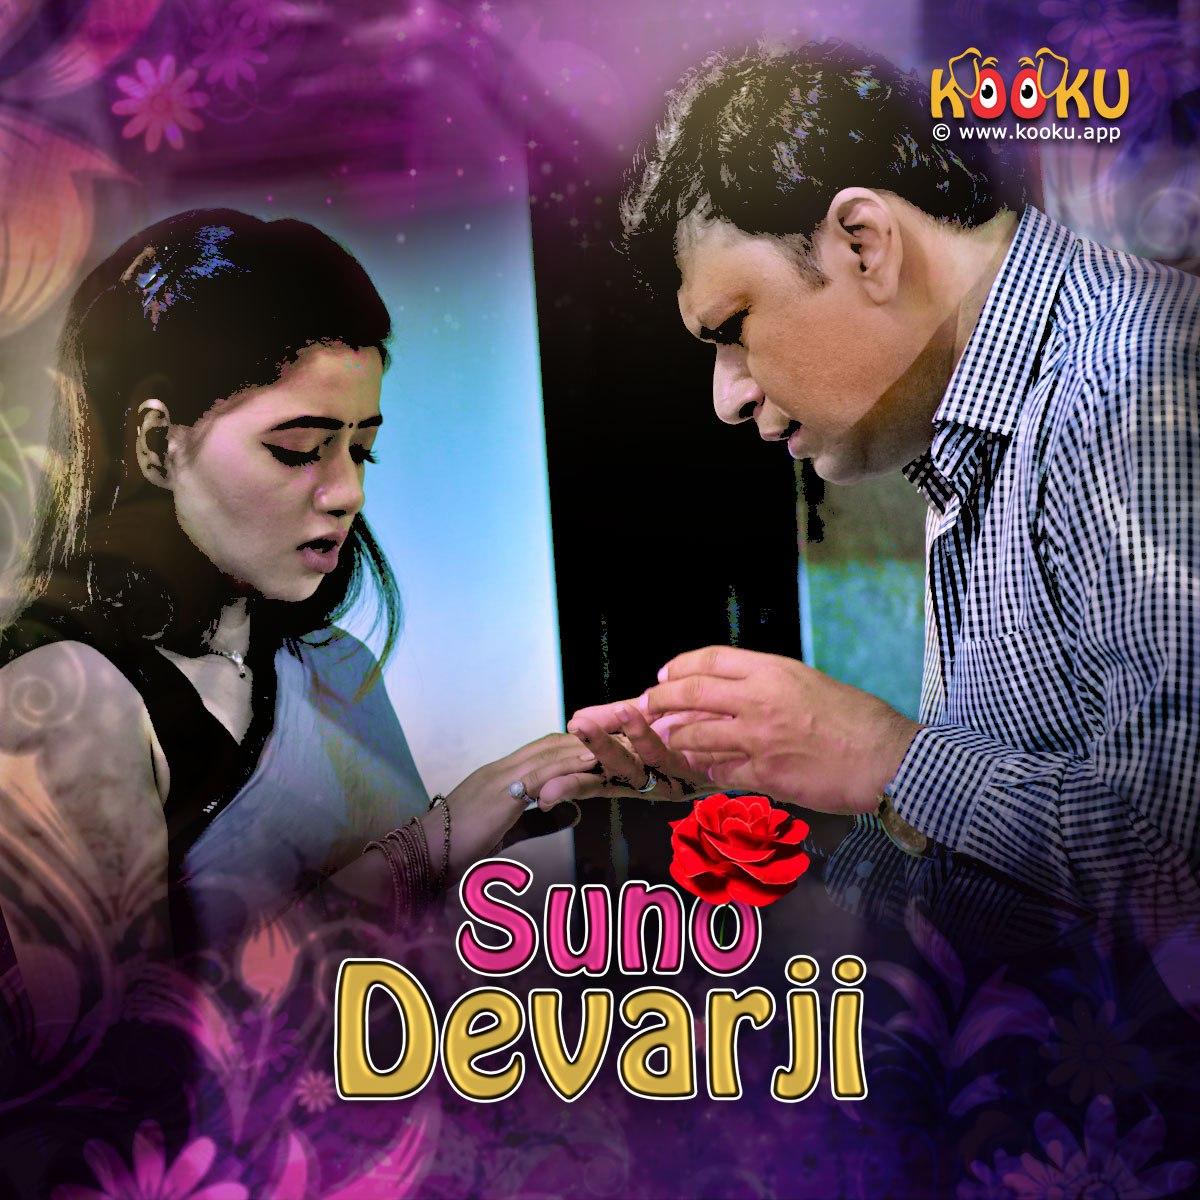 Suno Devarji 2020 Season 01 Hindi Kooku App Web Series Official Trailer 1080p HDRip Download